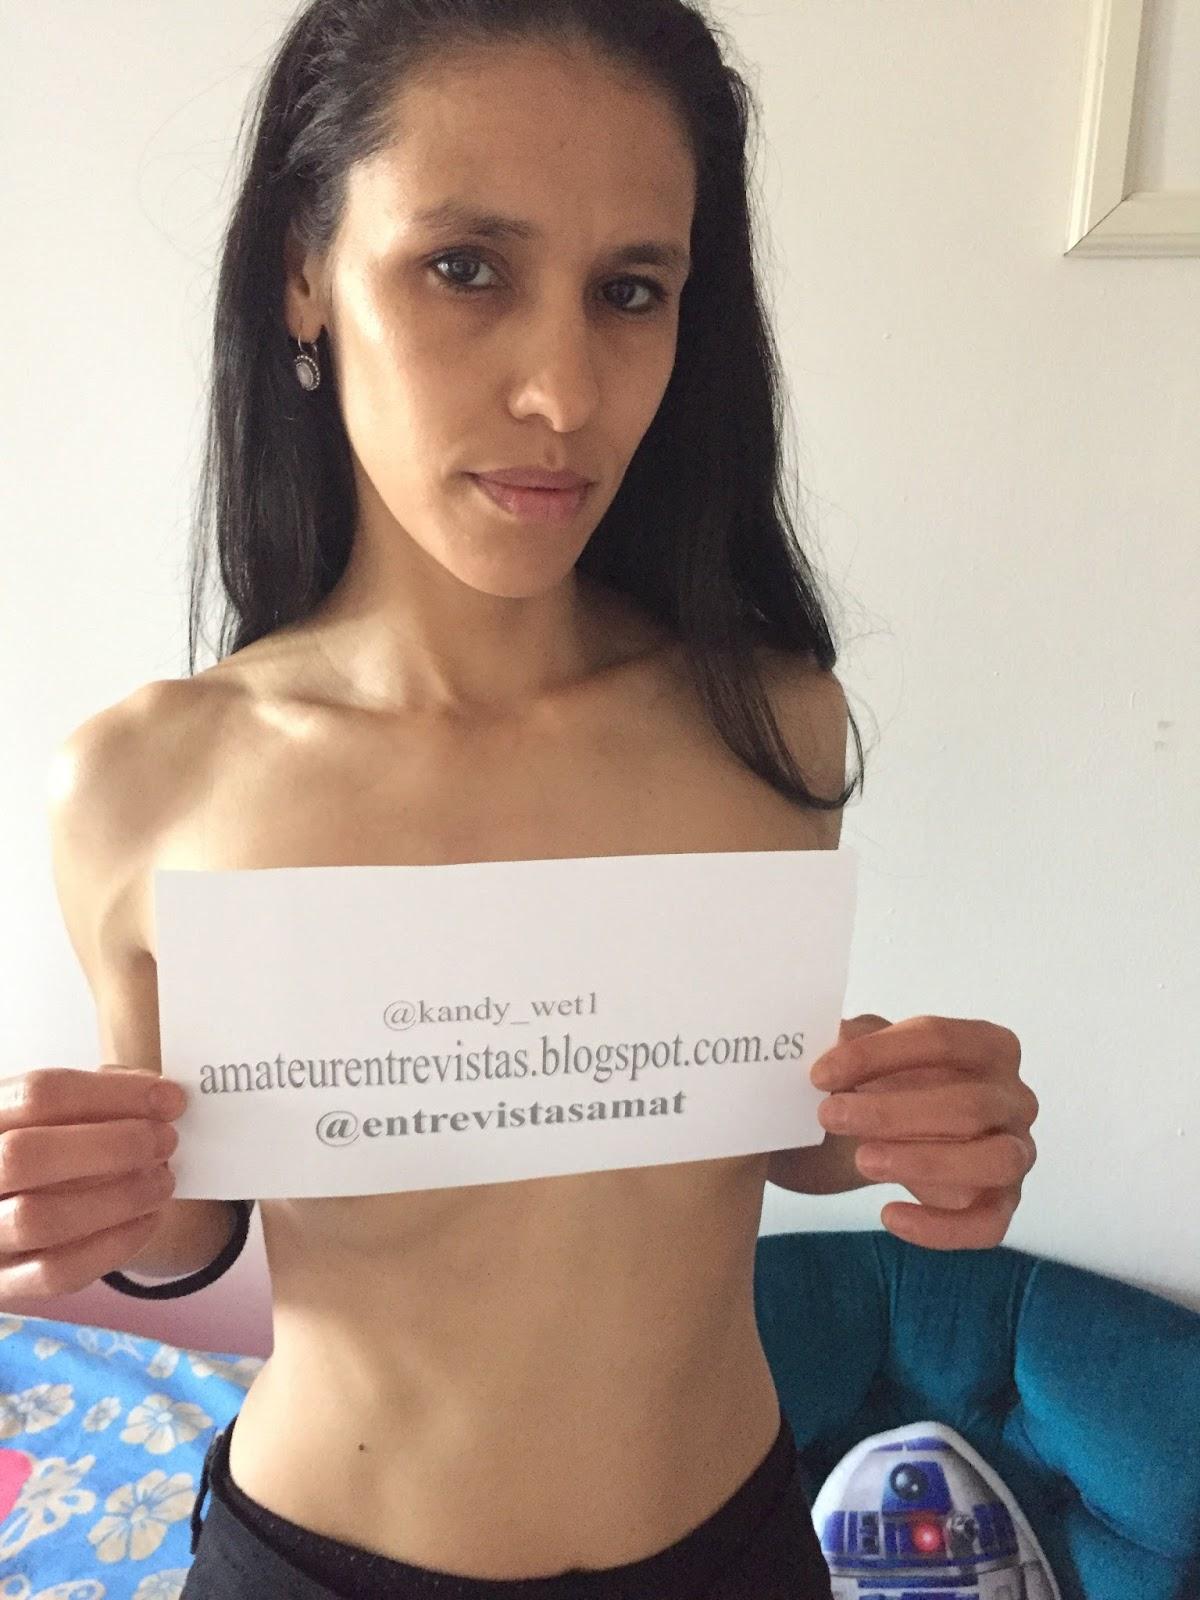 Actriz Porno Fakings entrevistas amateur: kandy wet